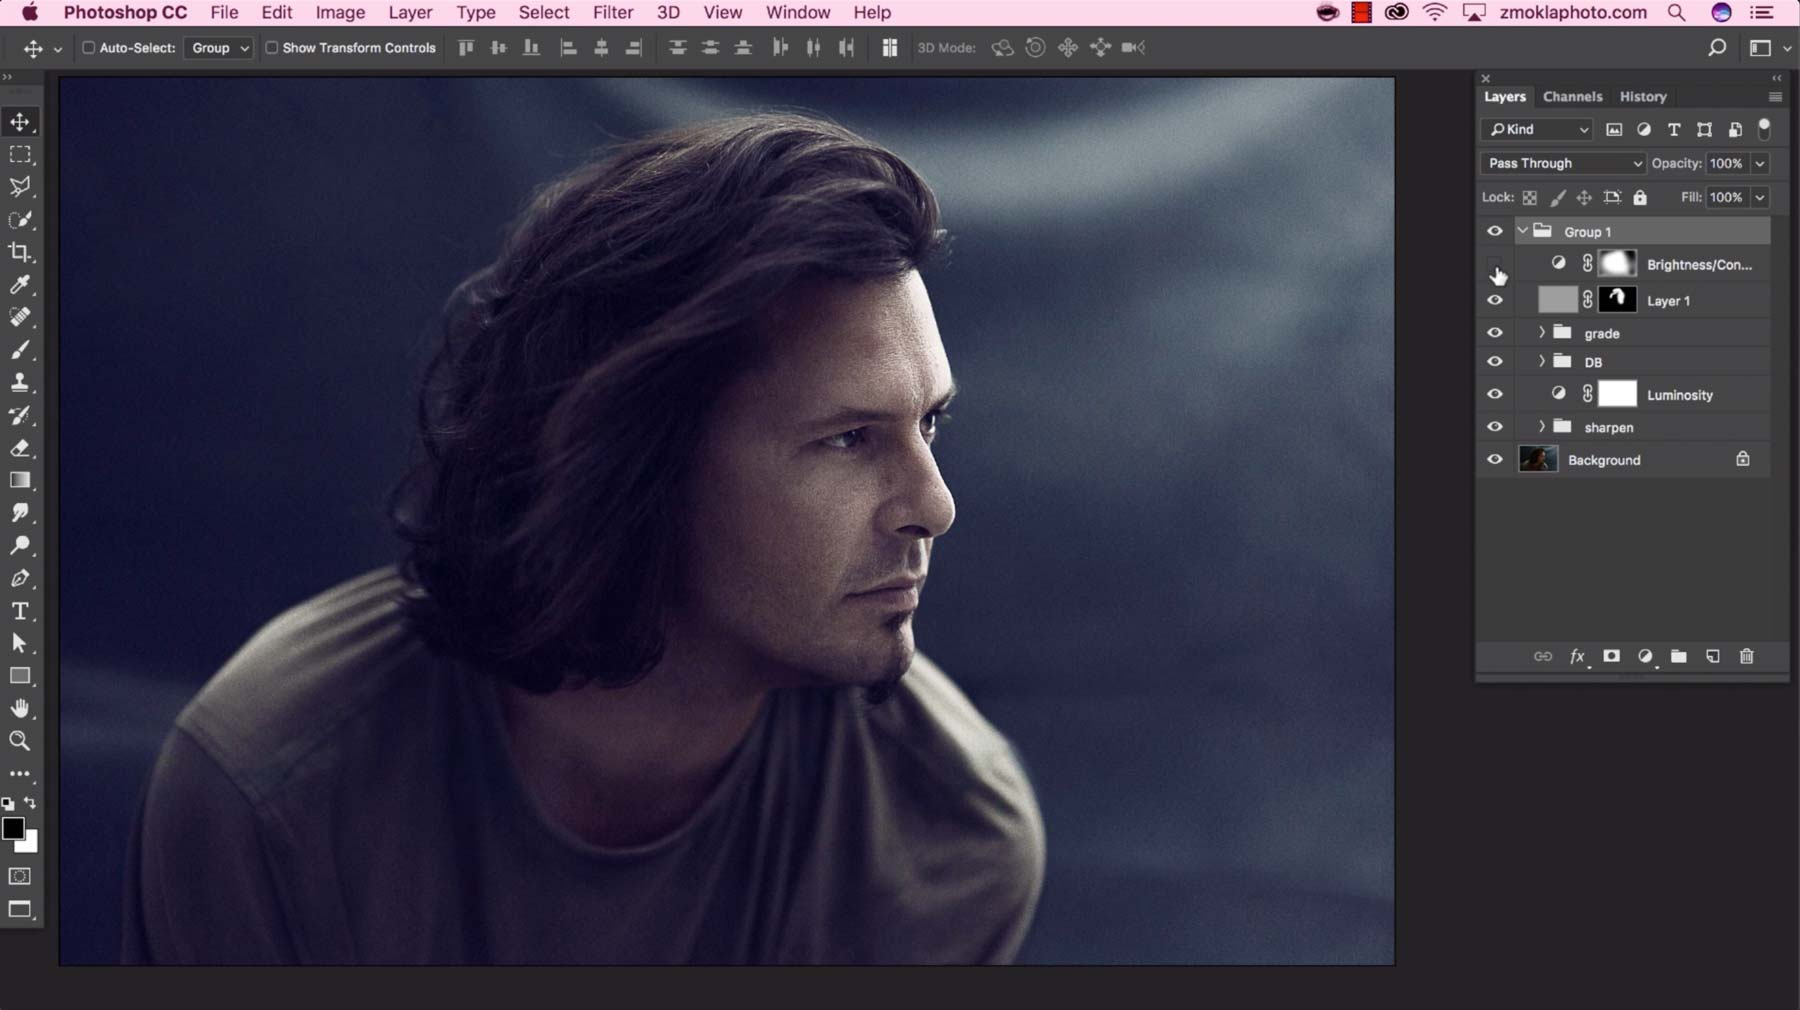 Complete Photo Edit 2: Stefan